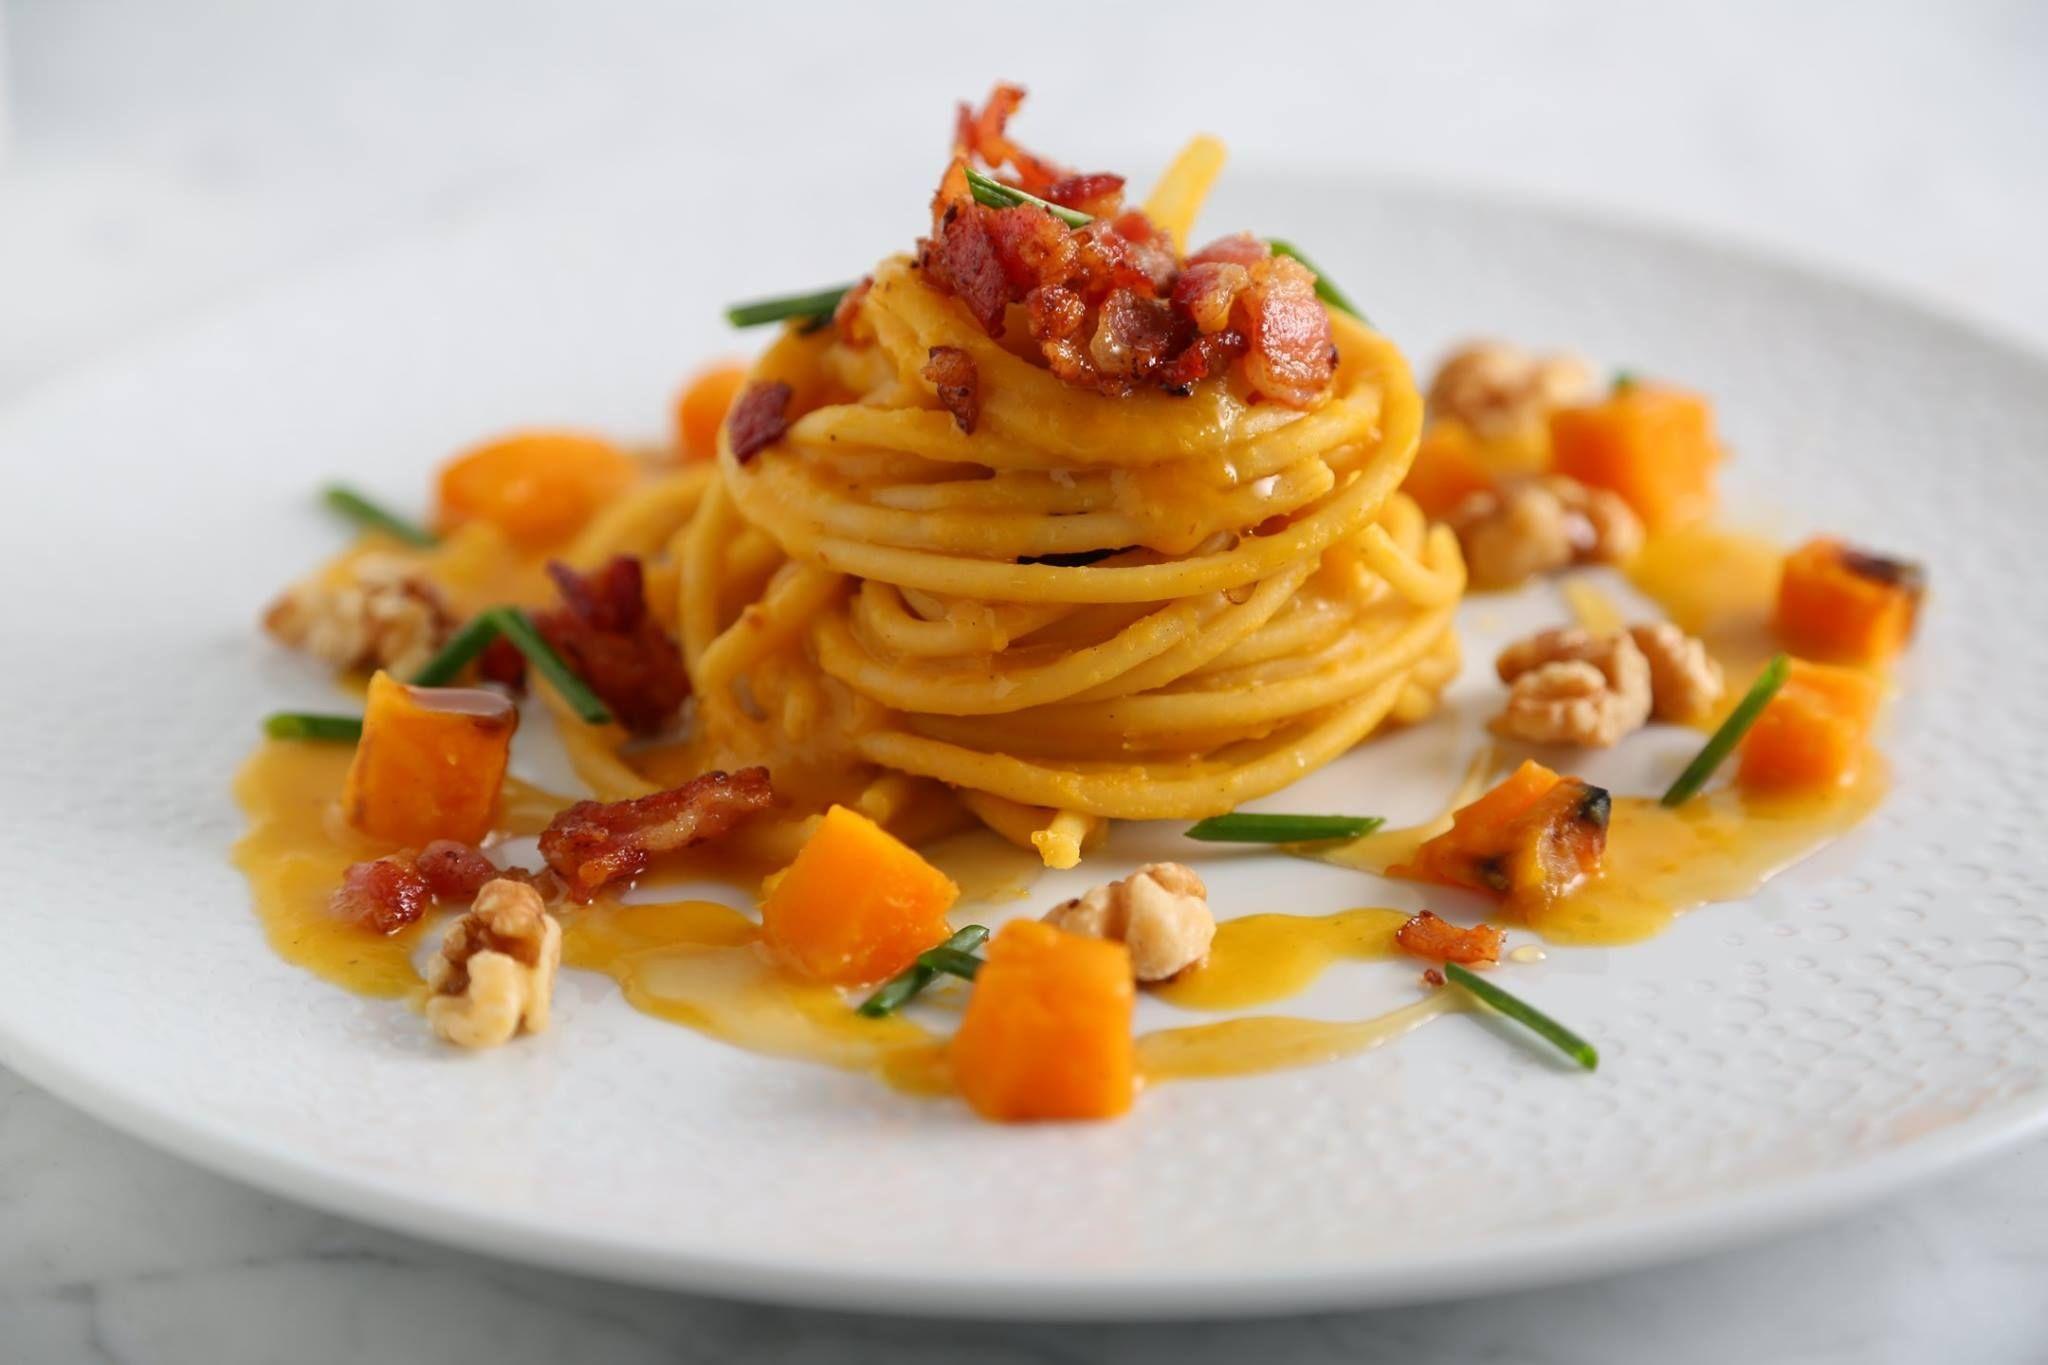 Bucatini Pasta Recipe with Butternut Squash, Hickory-Smoked Bacon, & Walnuts